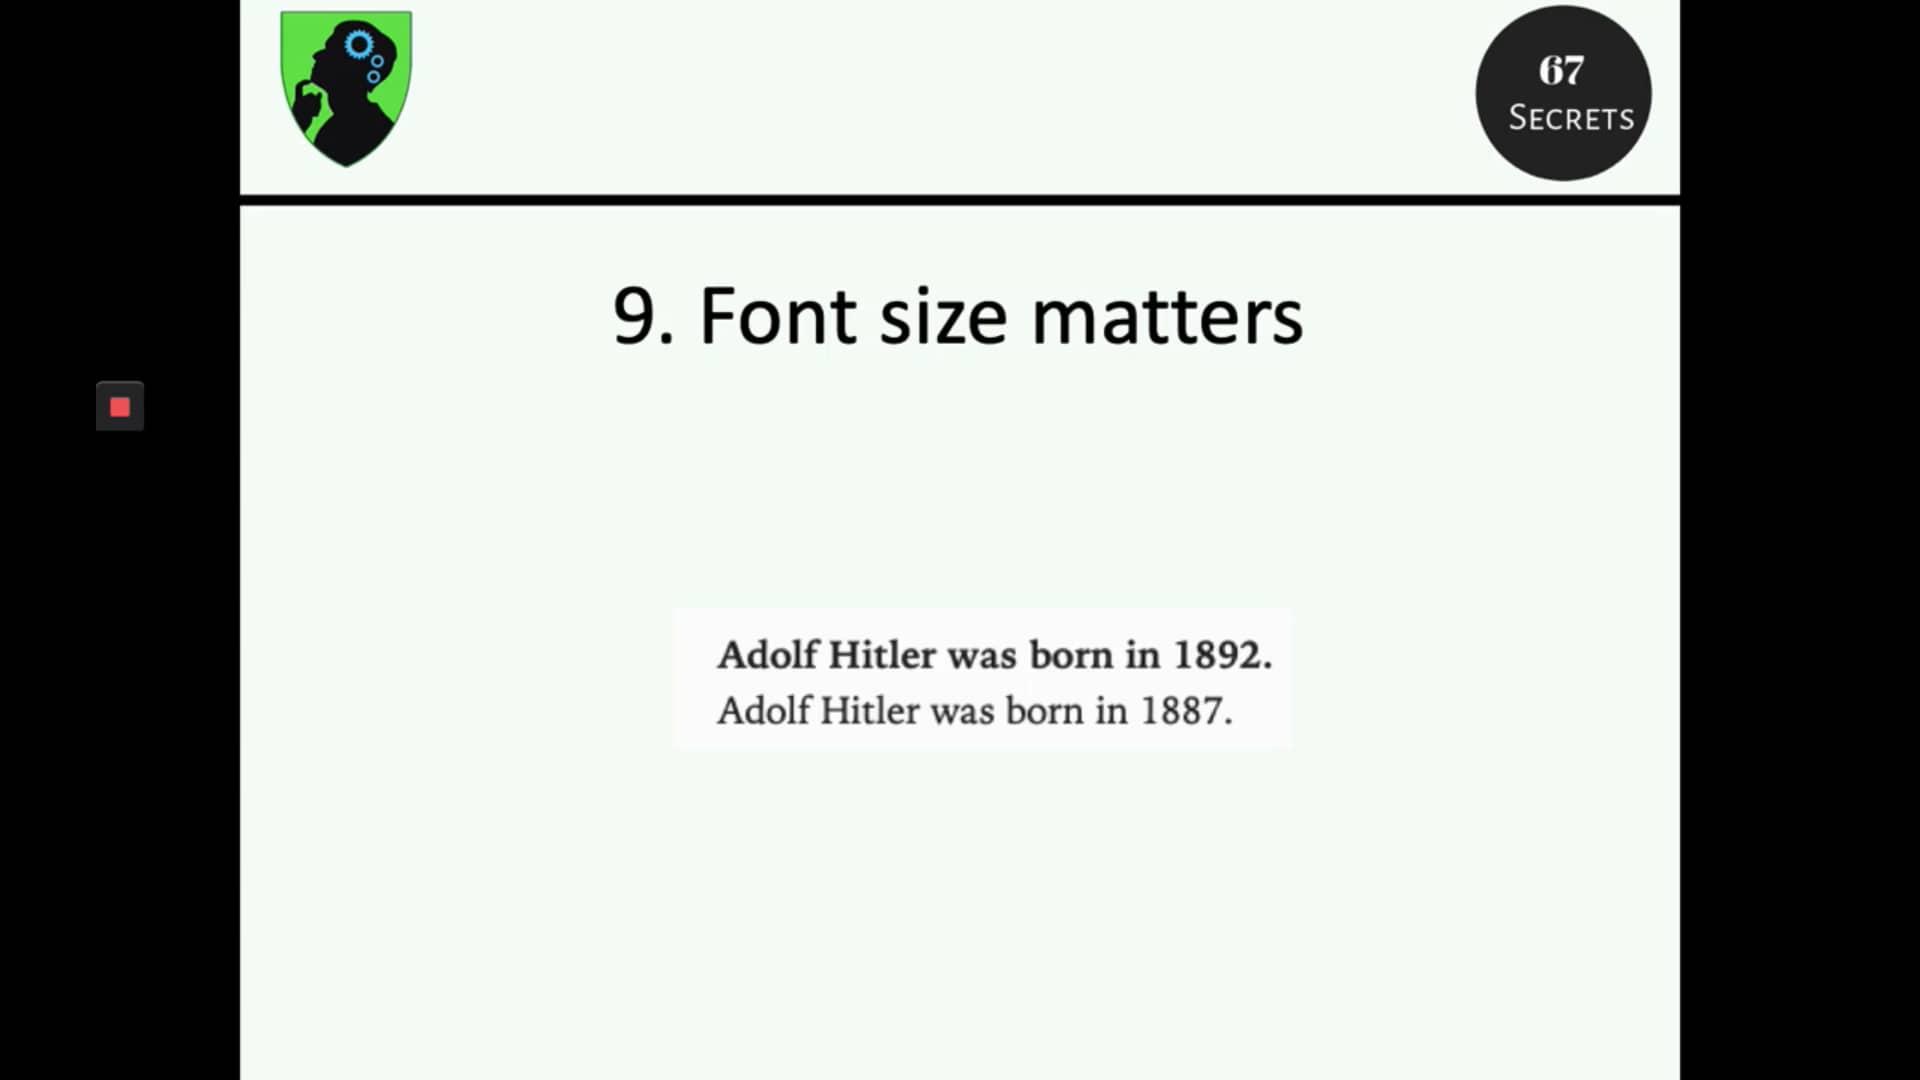 9. Font Size Matters